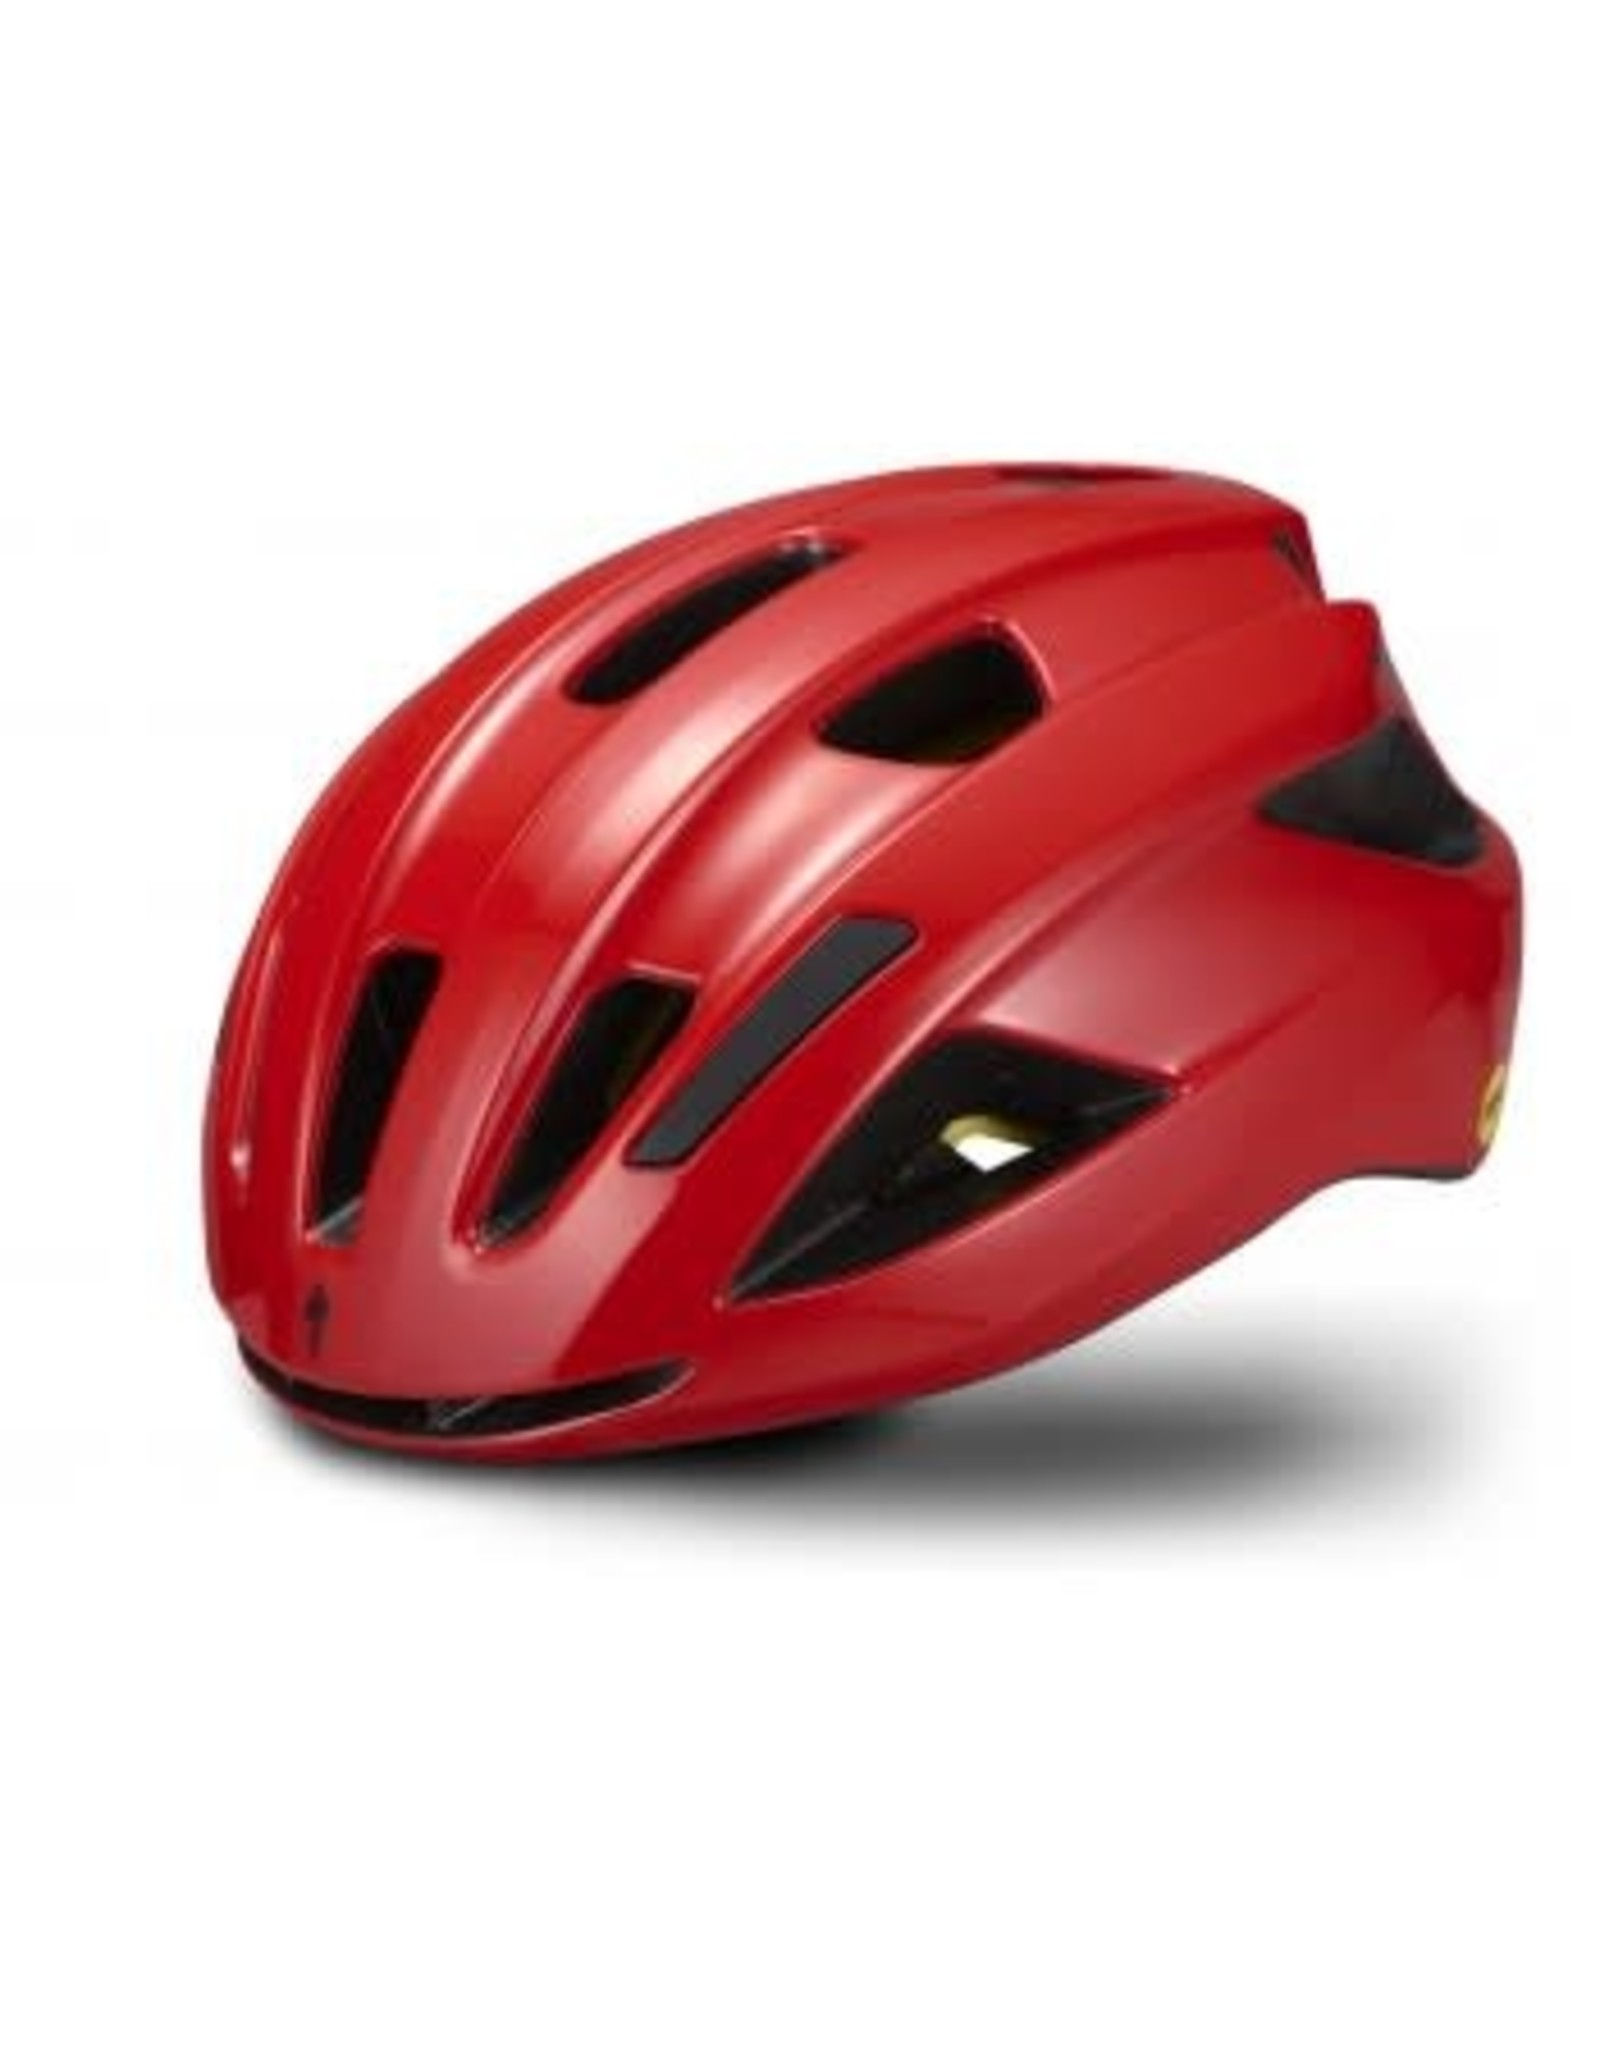 Specialized Helmet Spec Align II MIPS FloRed XL